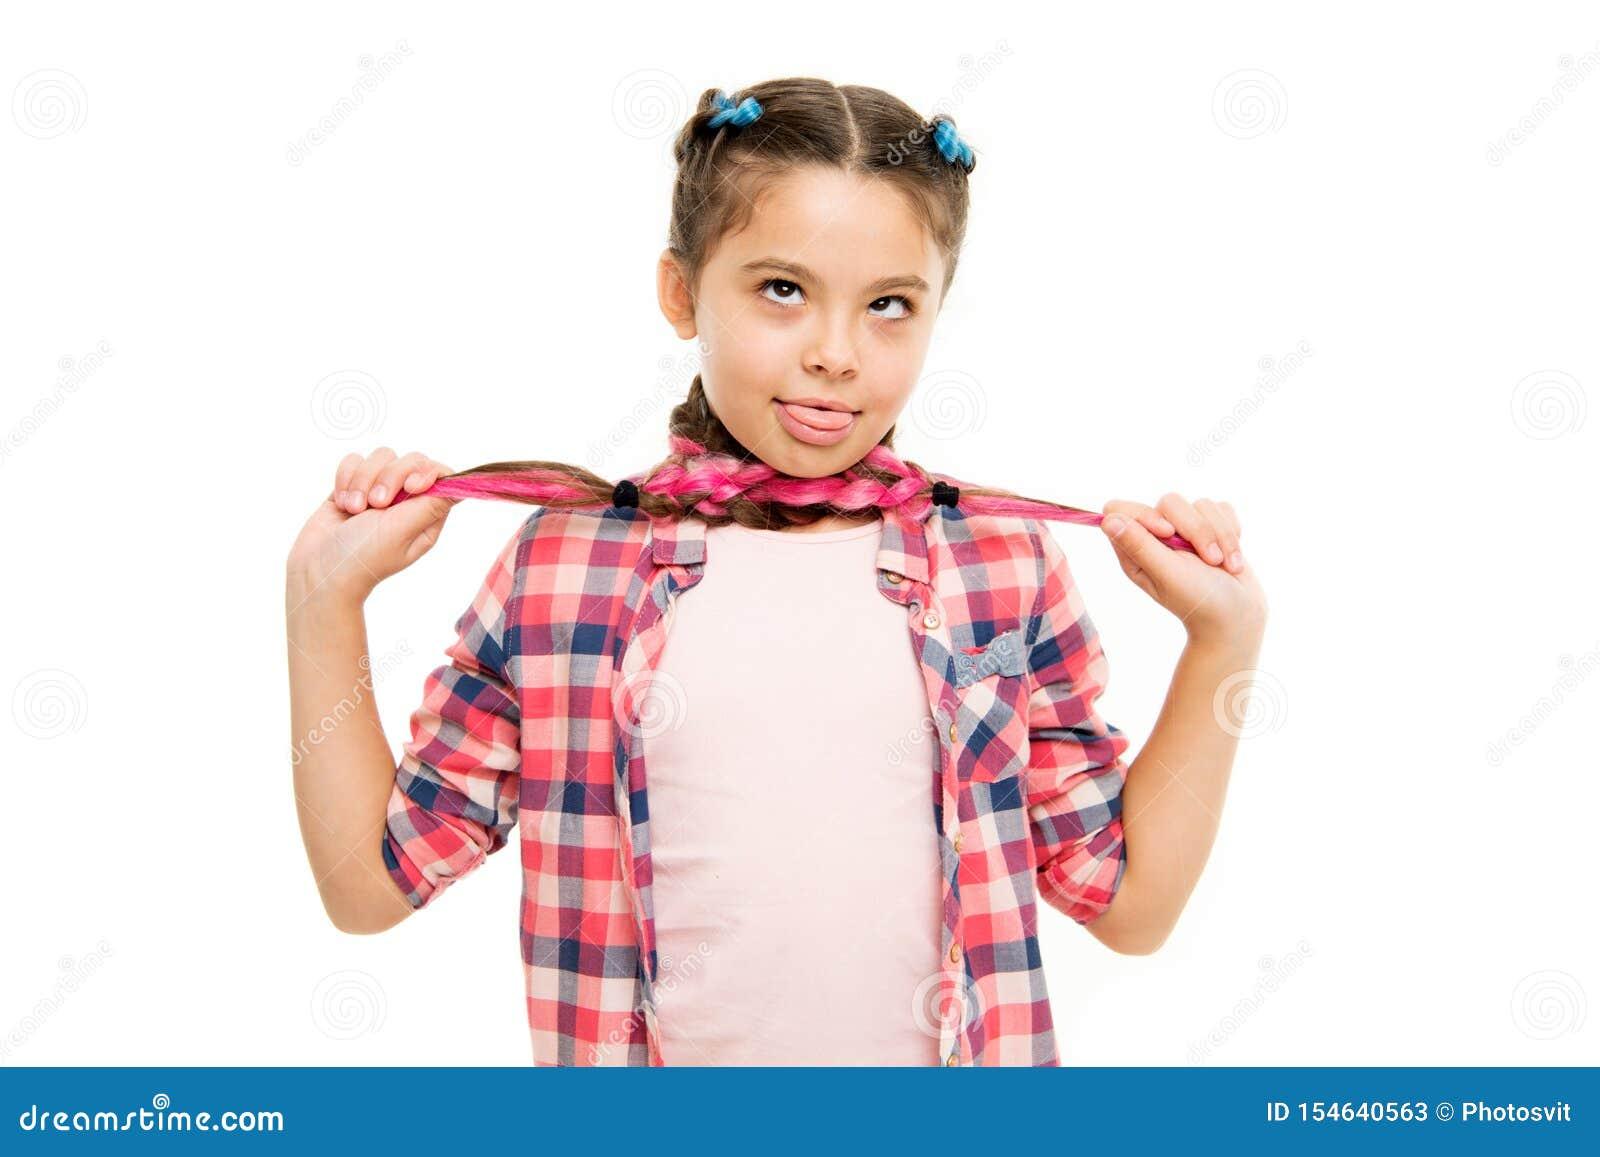 Diy的发型 女孩长的辫子 m 时兴的cutie 女性发型 可爱的儿童好的发型